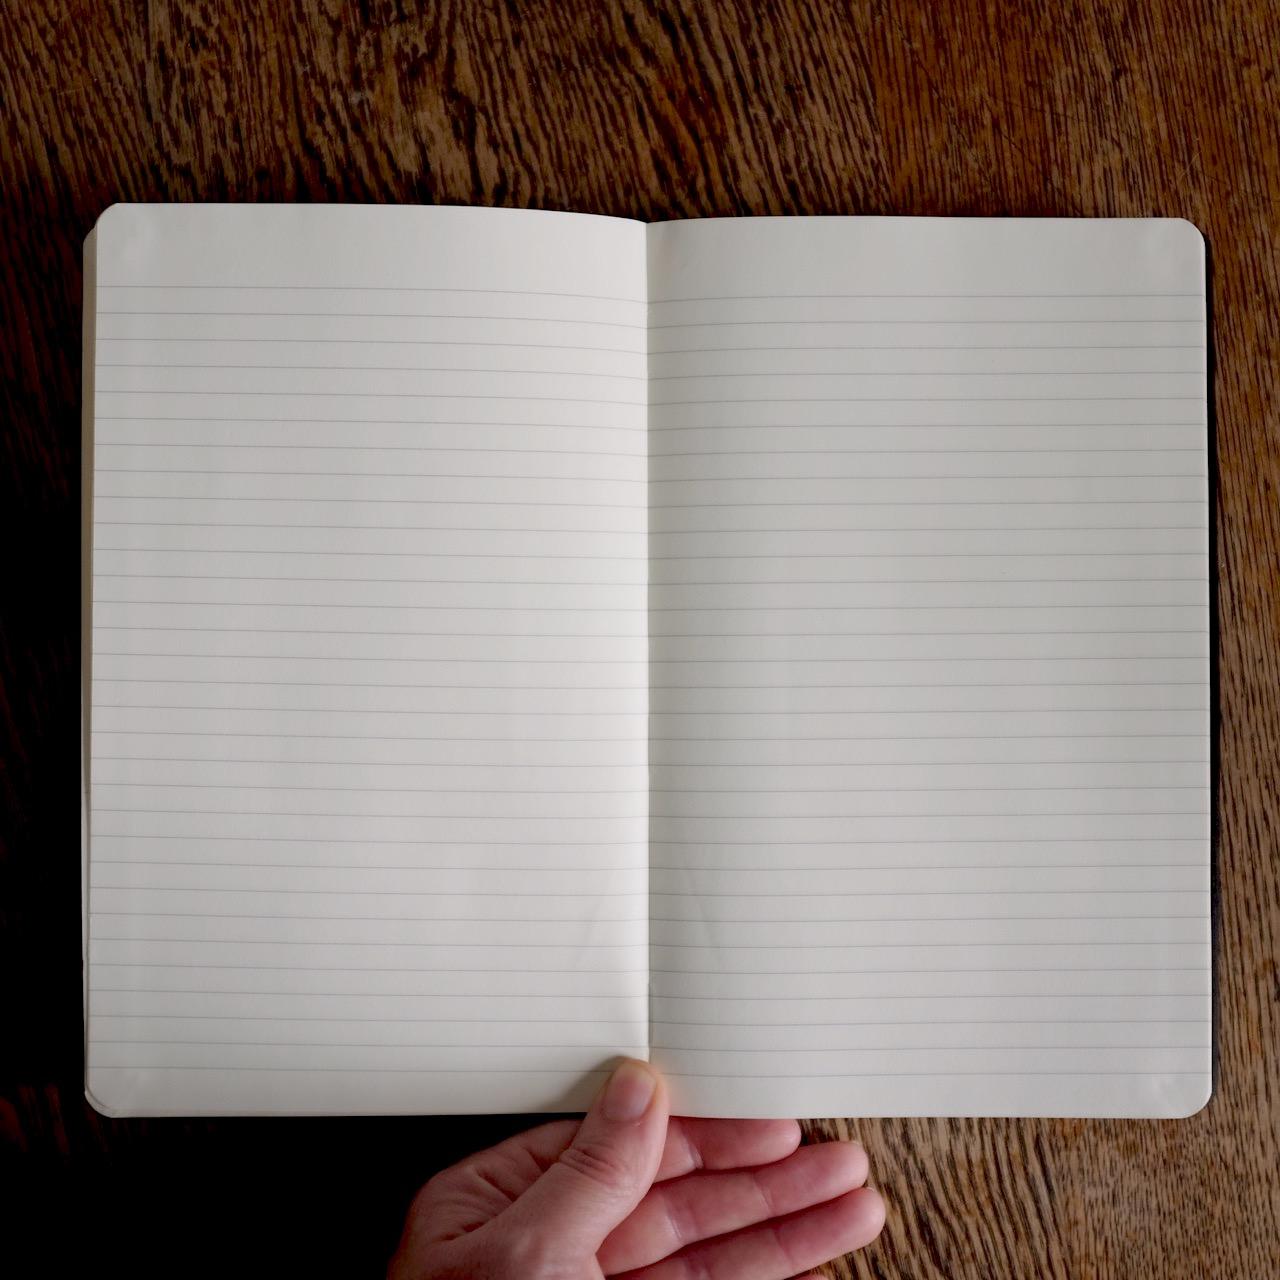 Classic Moleskine Notebook Soraya DSCF5233.jpg